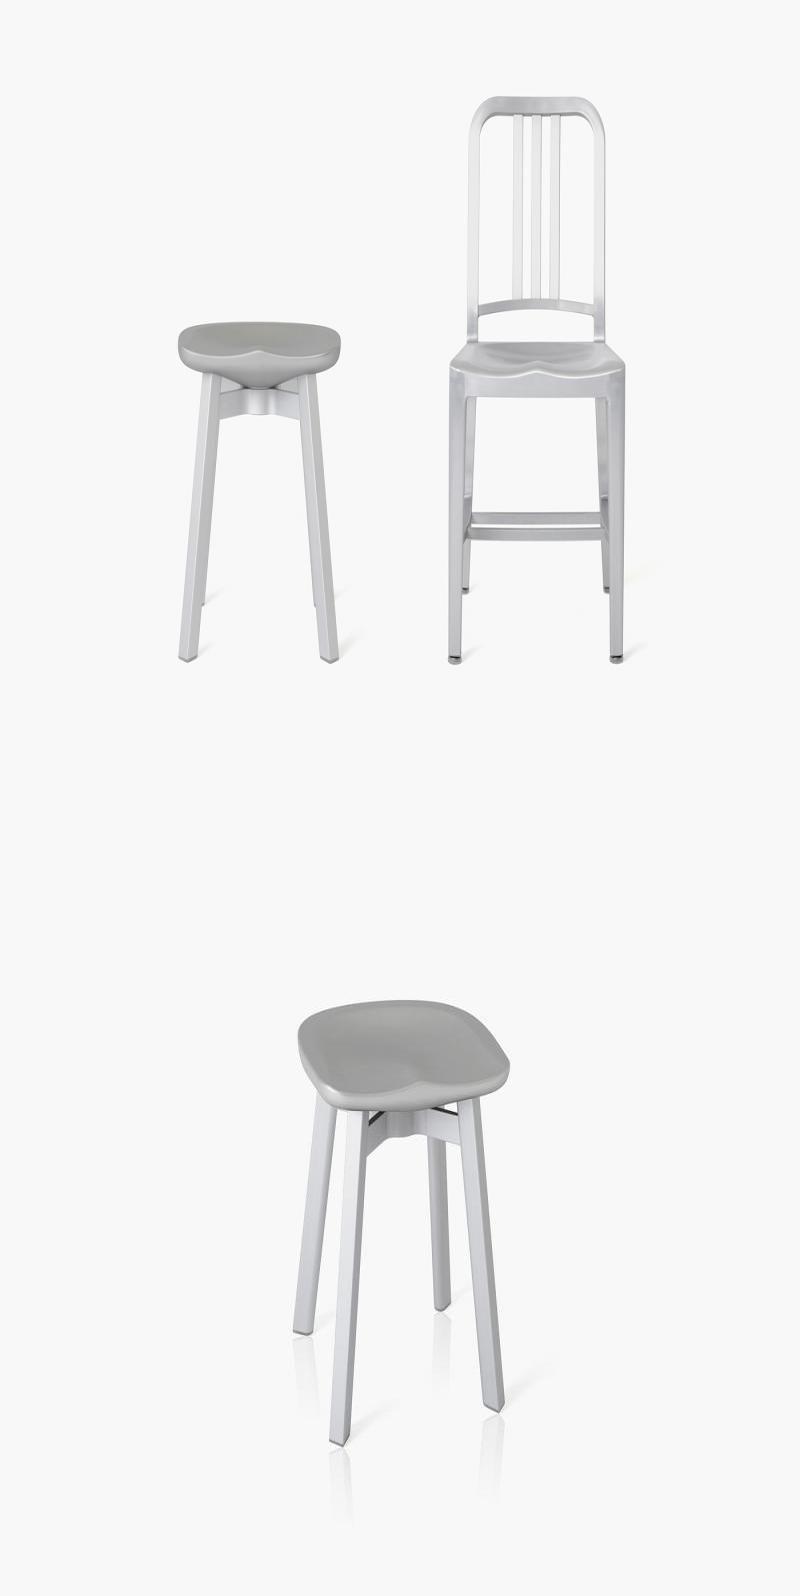 Aluminium Design Hocker Aluminium Design Hocker Dekoration